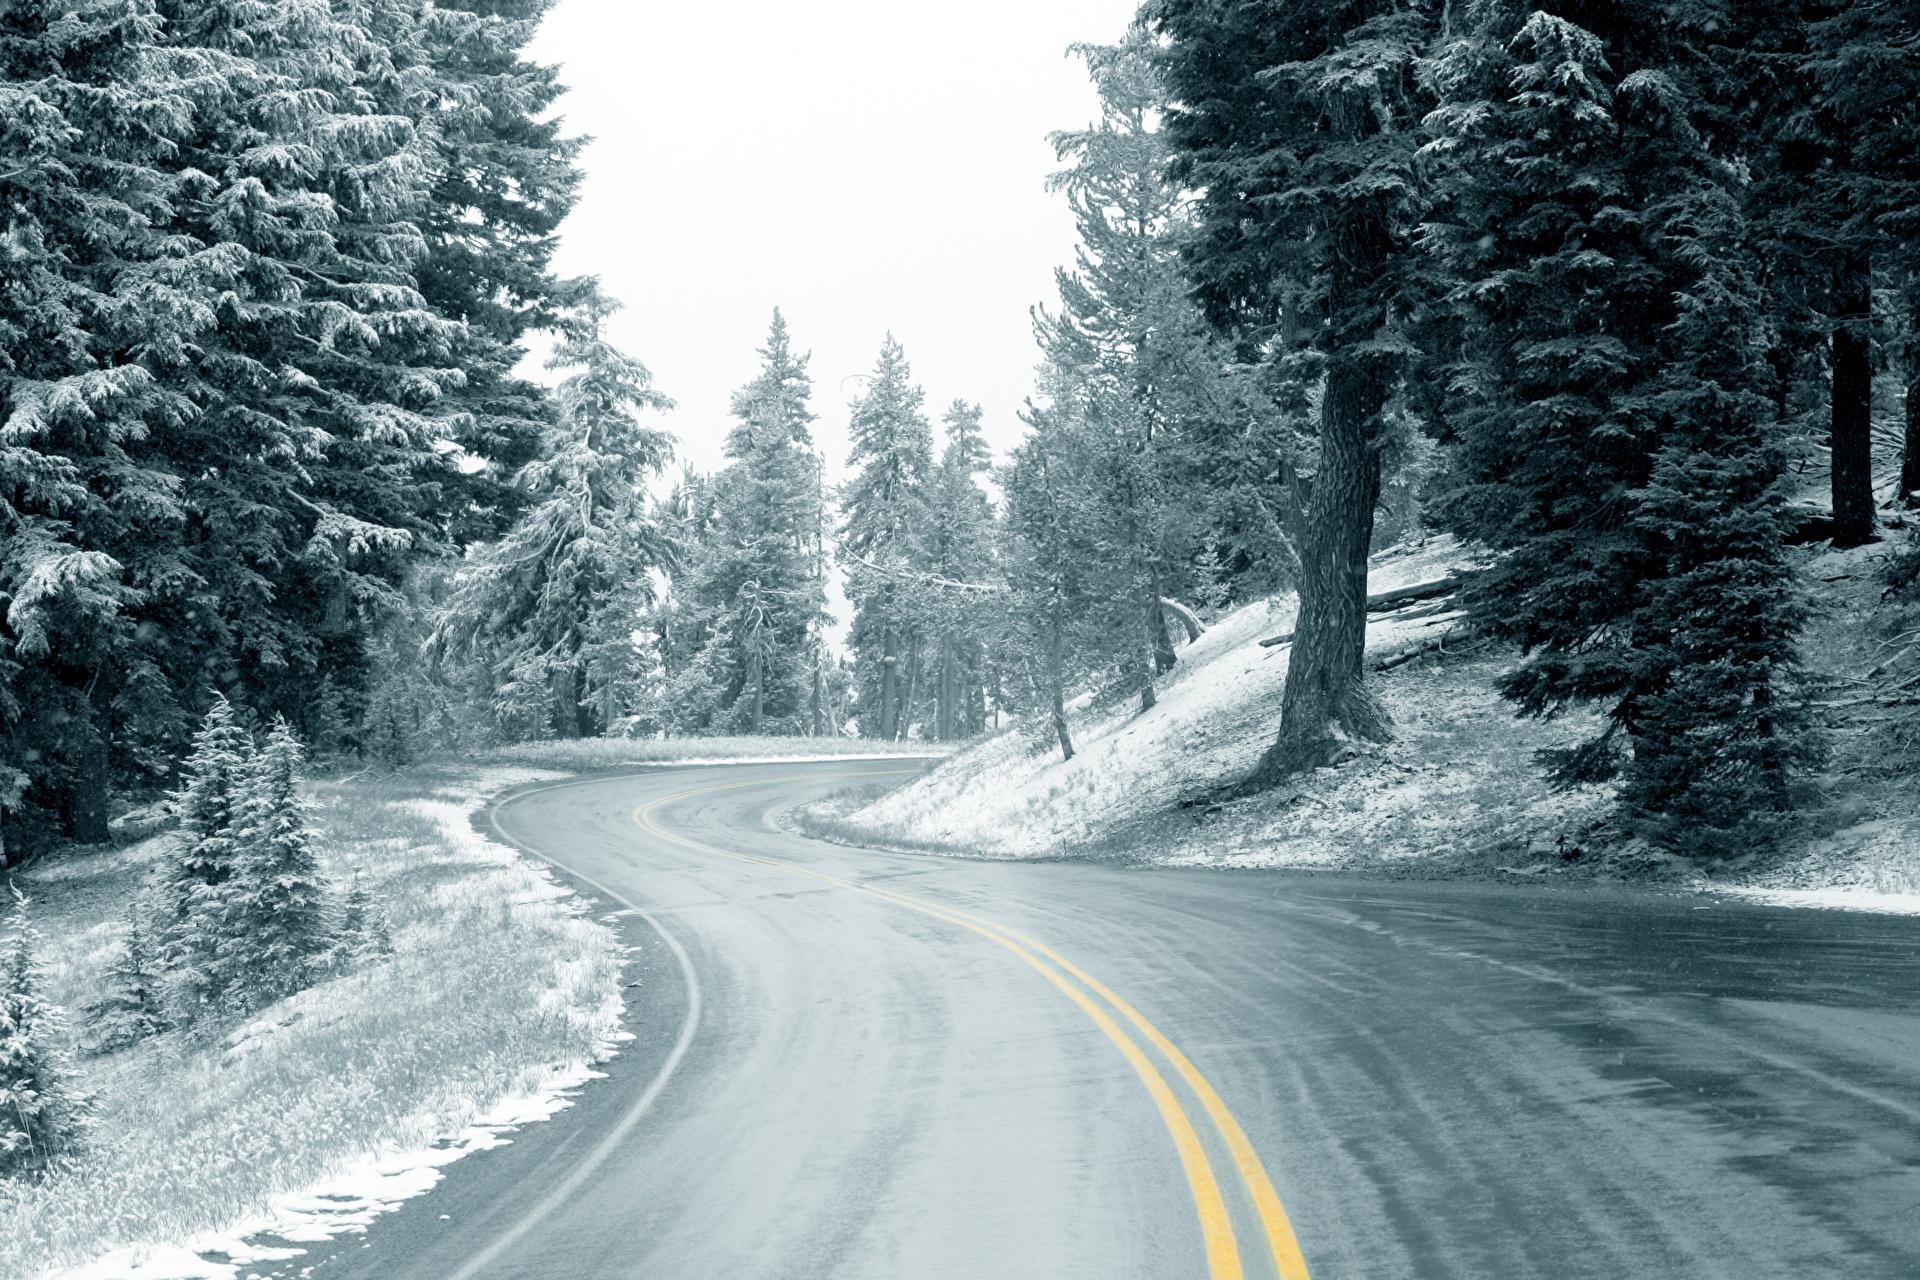 снег на дороге картинки фотографы видном